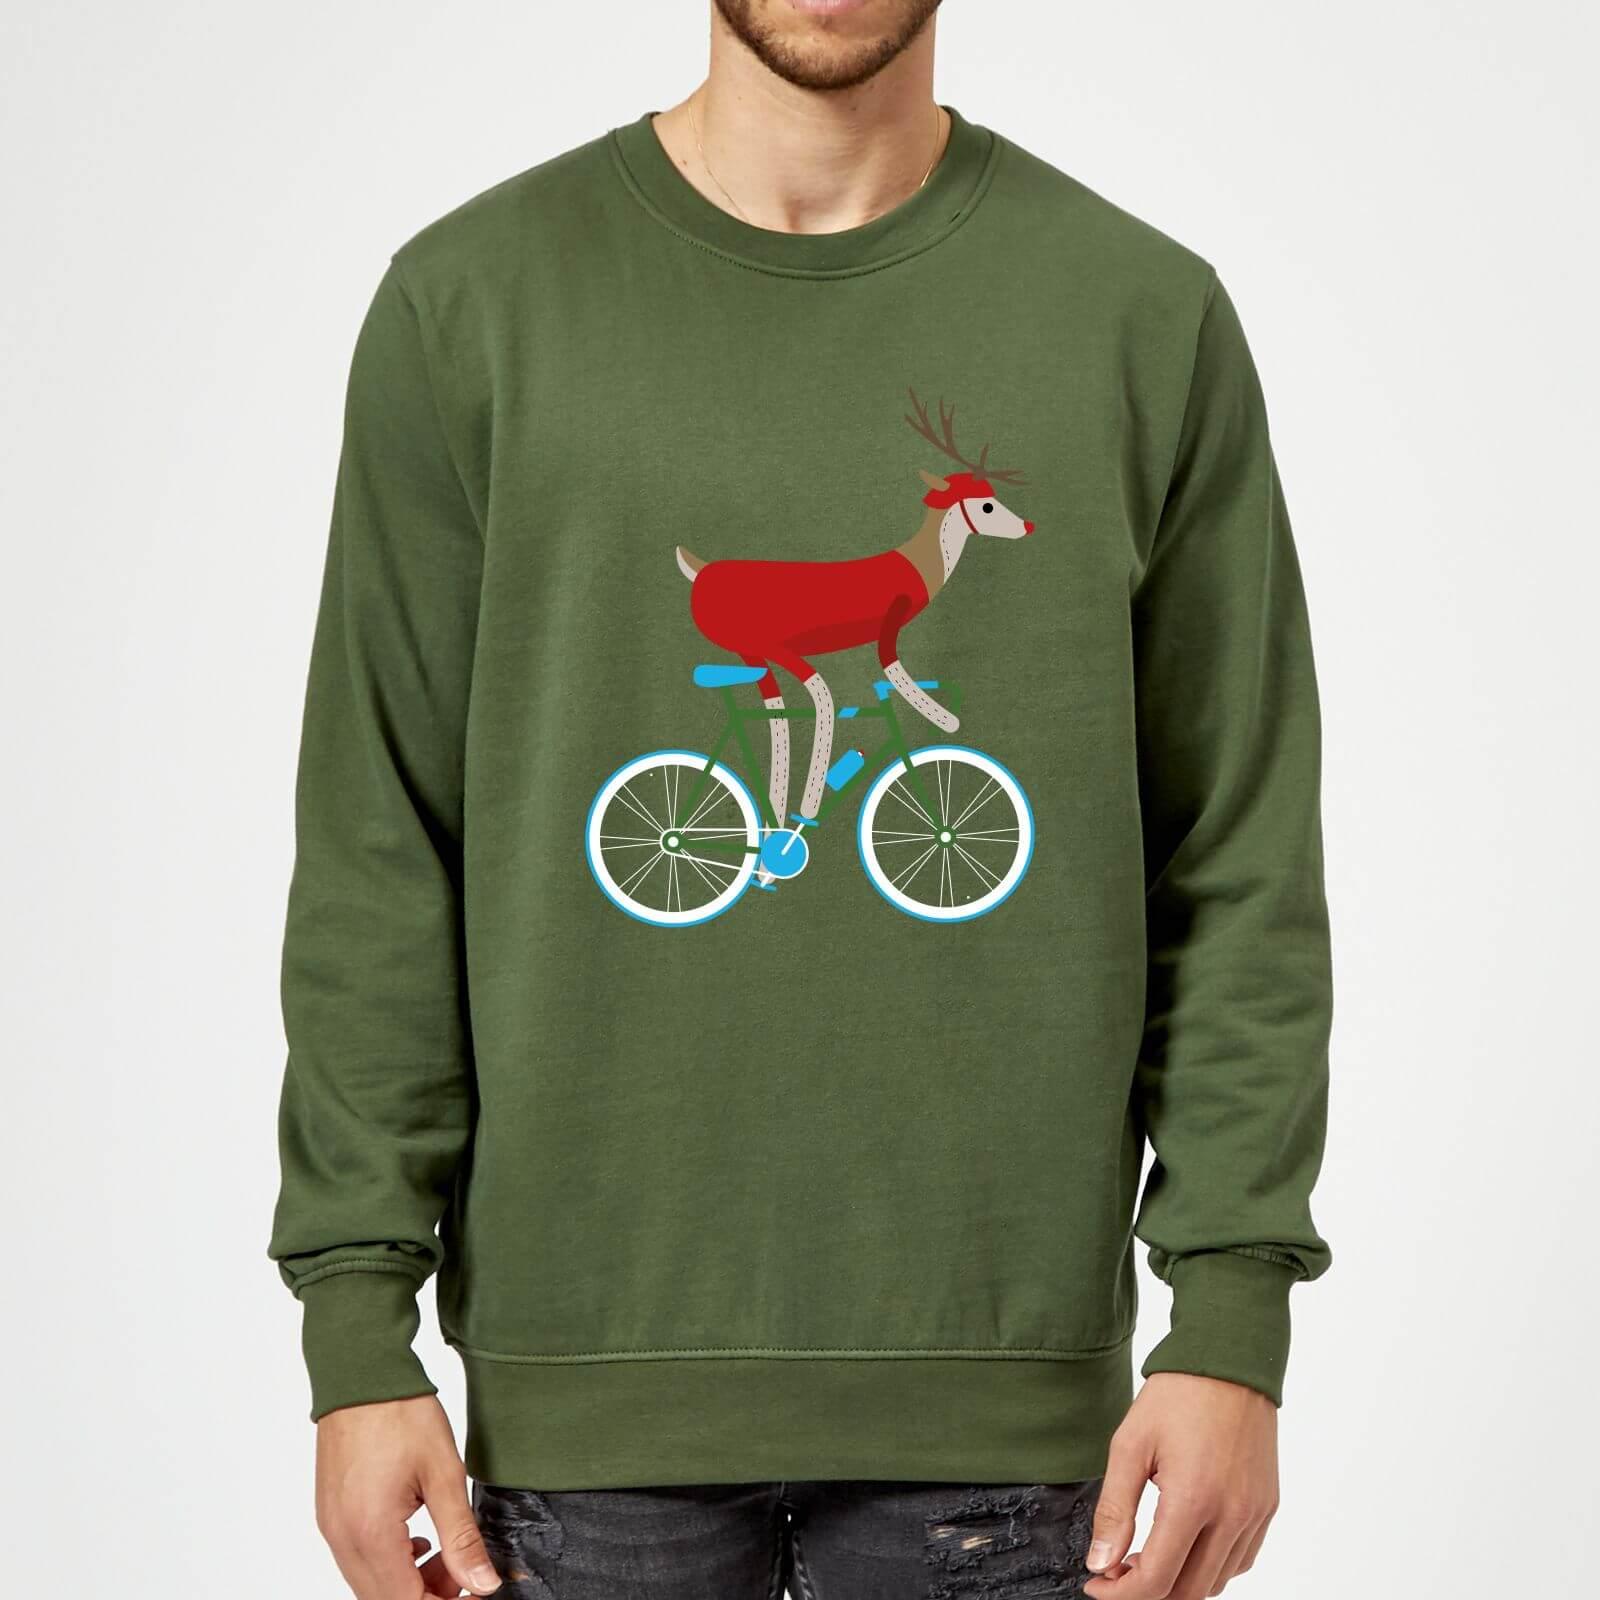 Biking Reindeer Christmas Sweatshirt - Forest Green - S - Forest Green